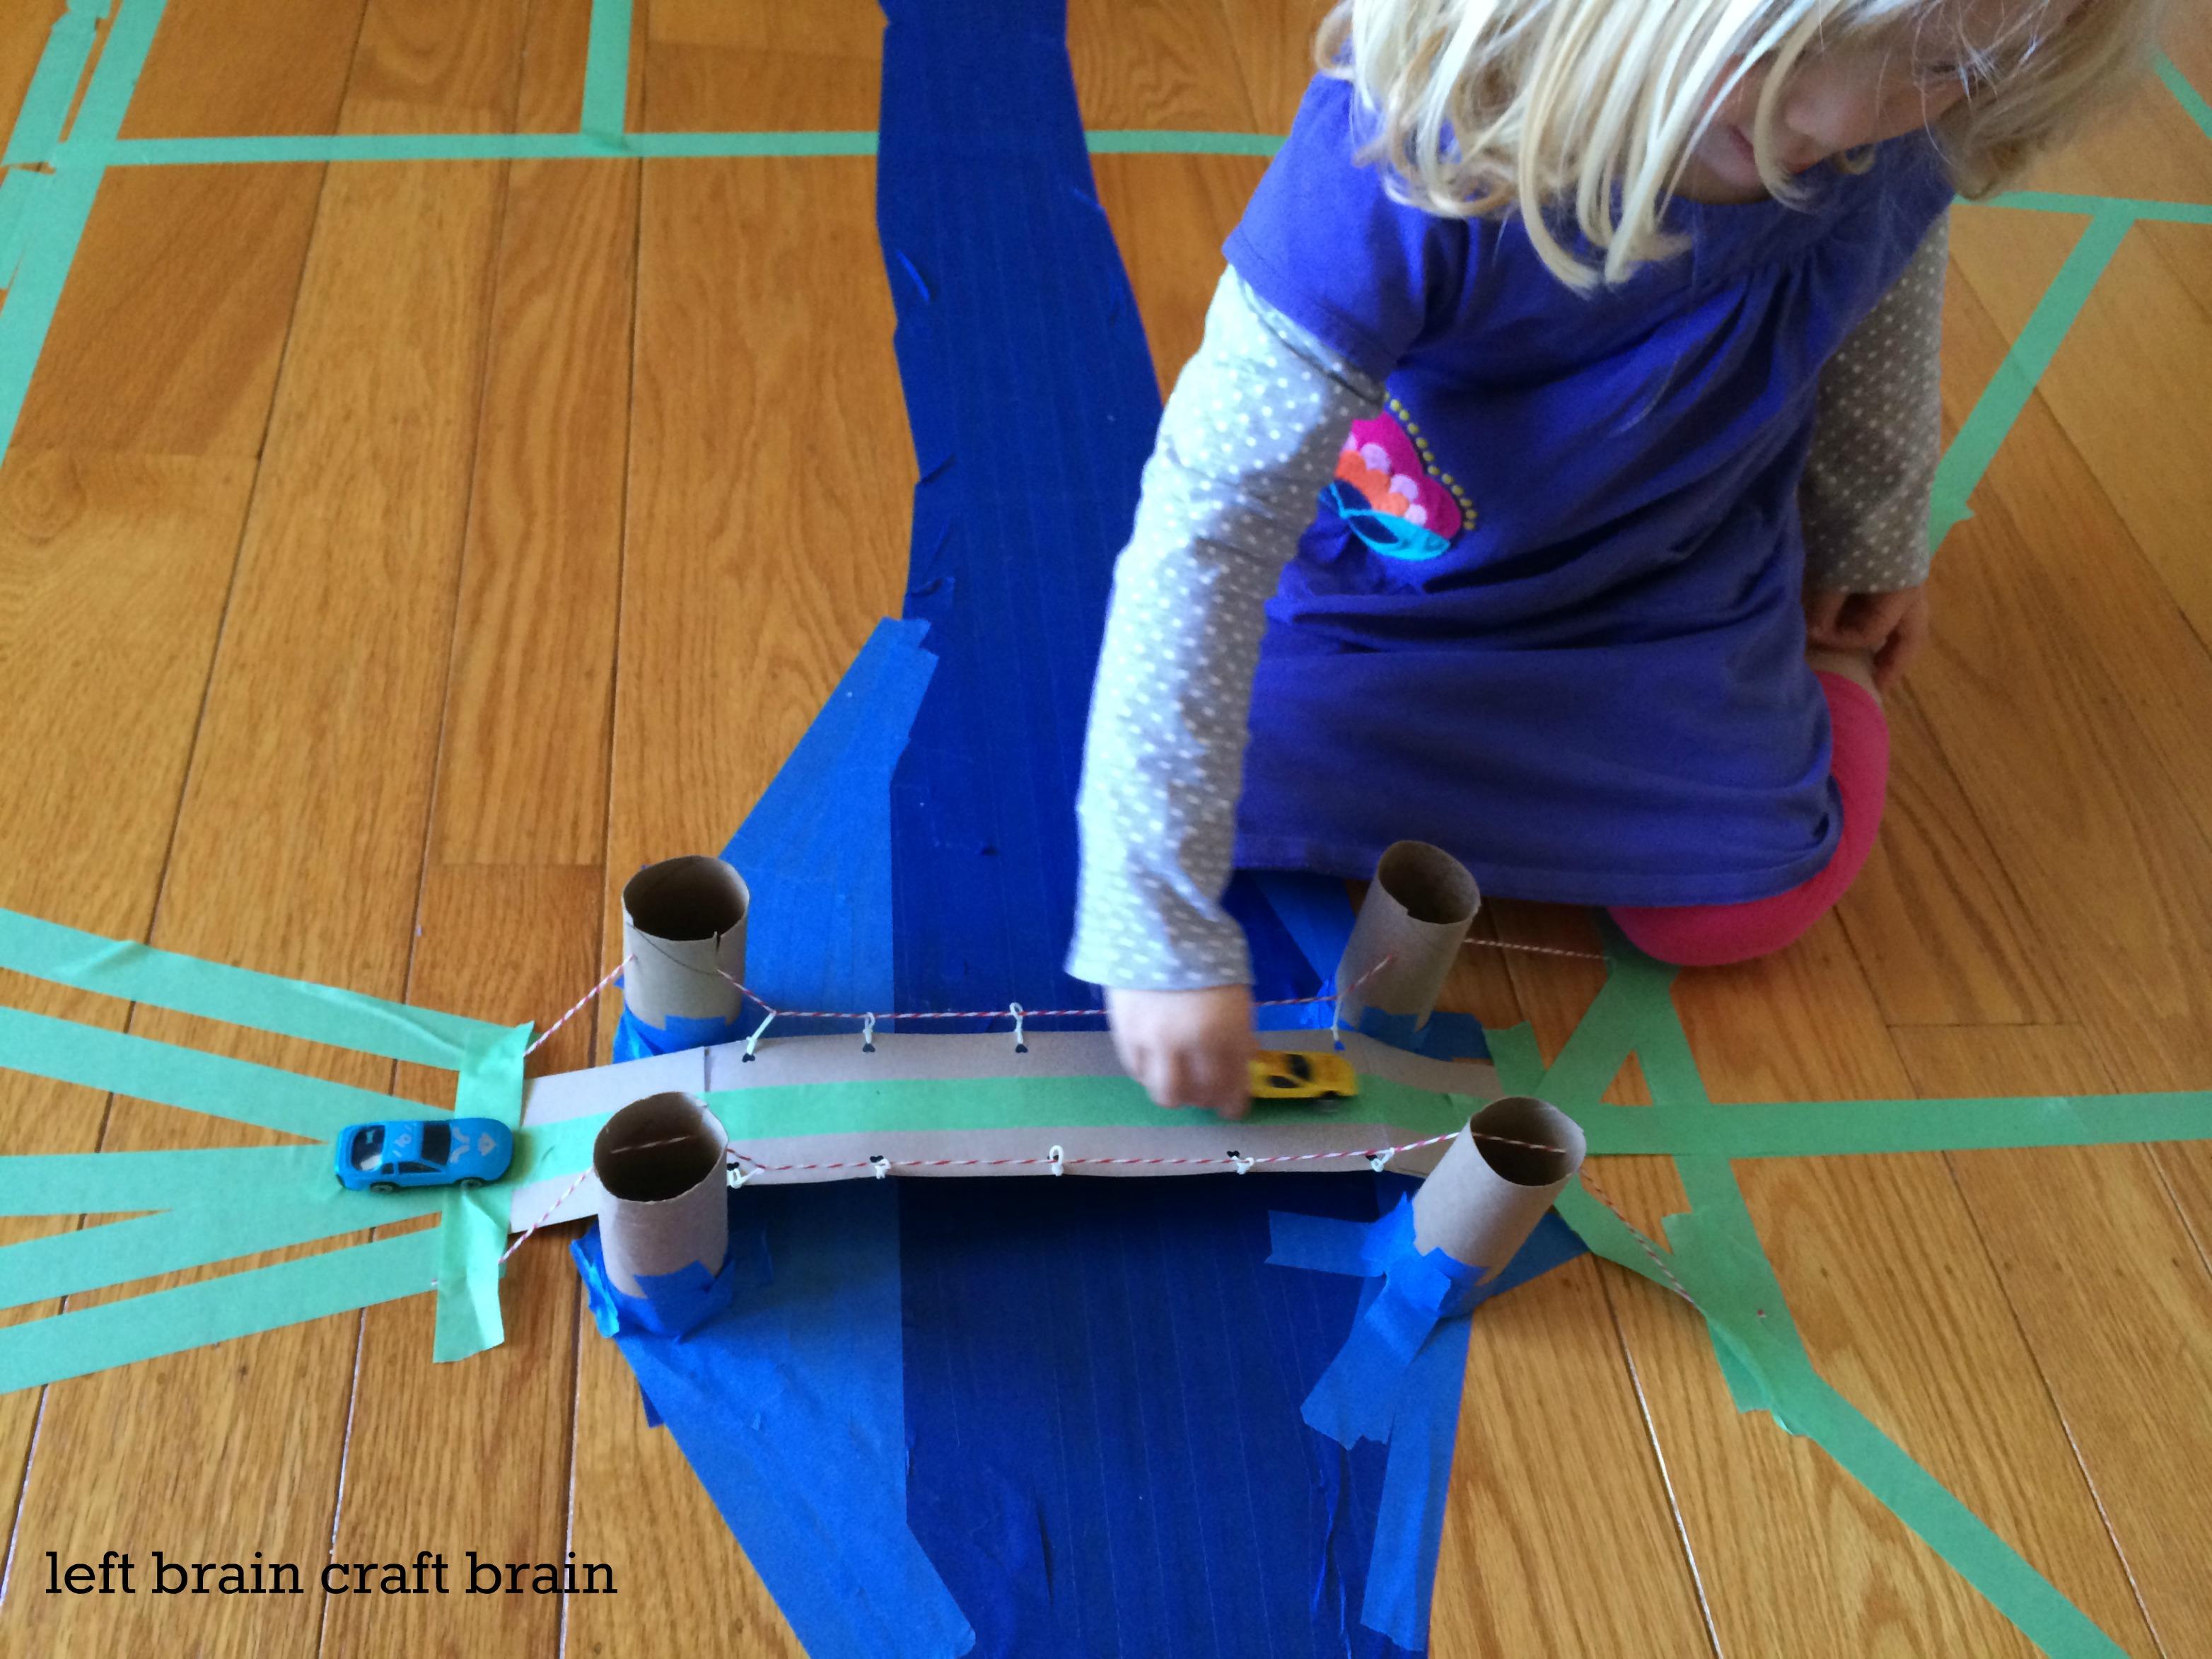 play diy recycled suspension bridge craft left brain craft brain